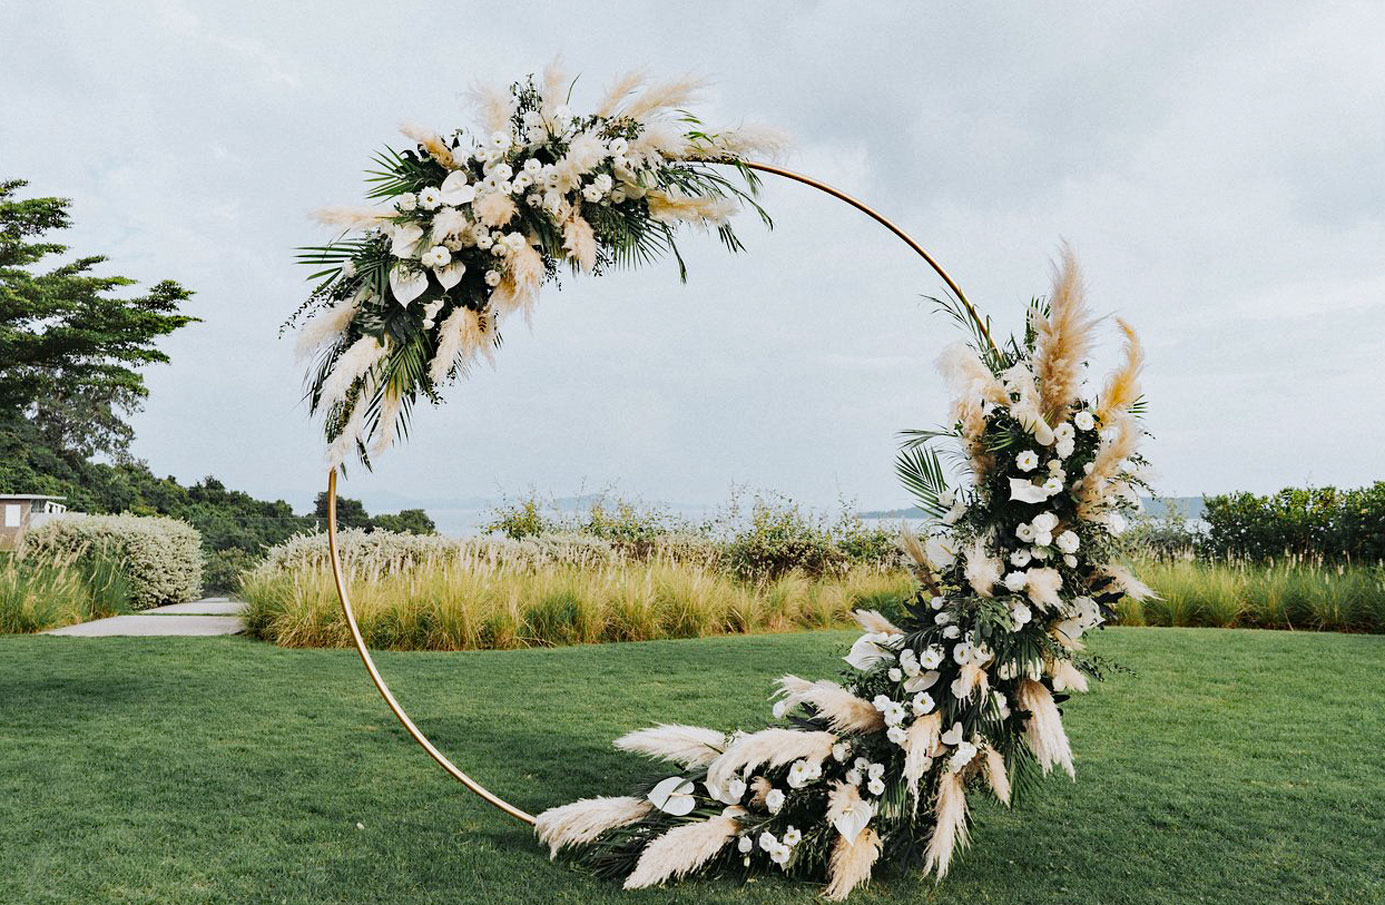 phuket-wedding-como (12)